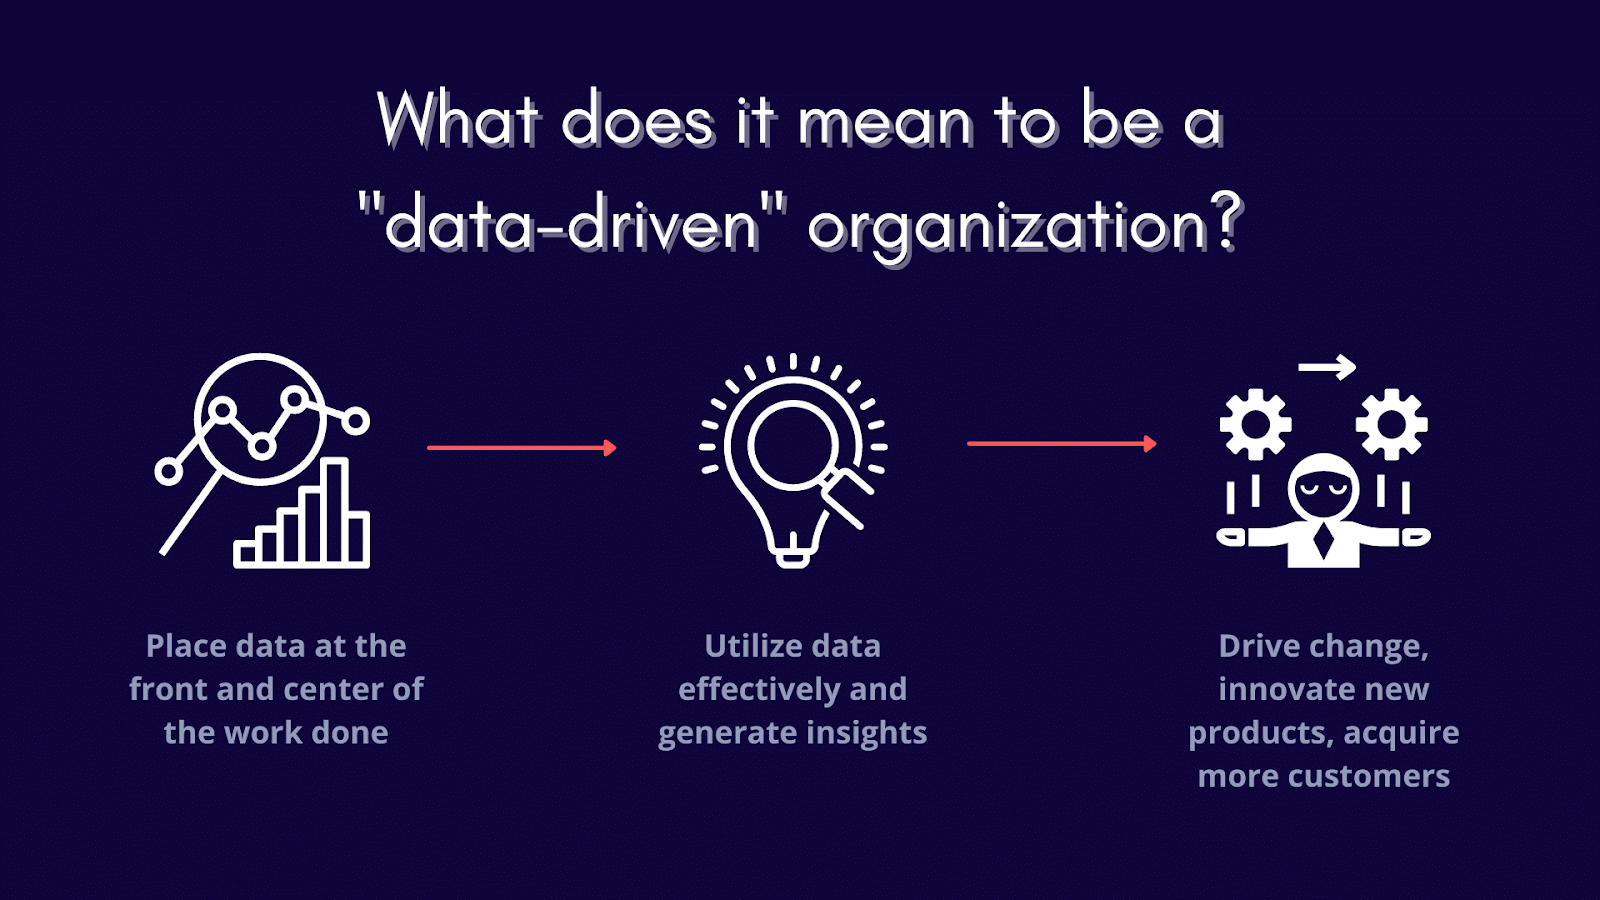 Data Driven Organization with QBO